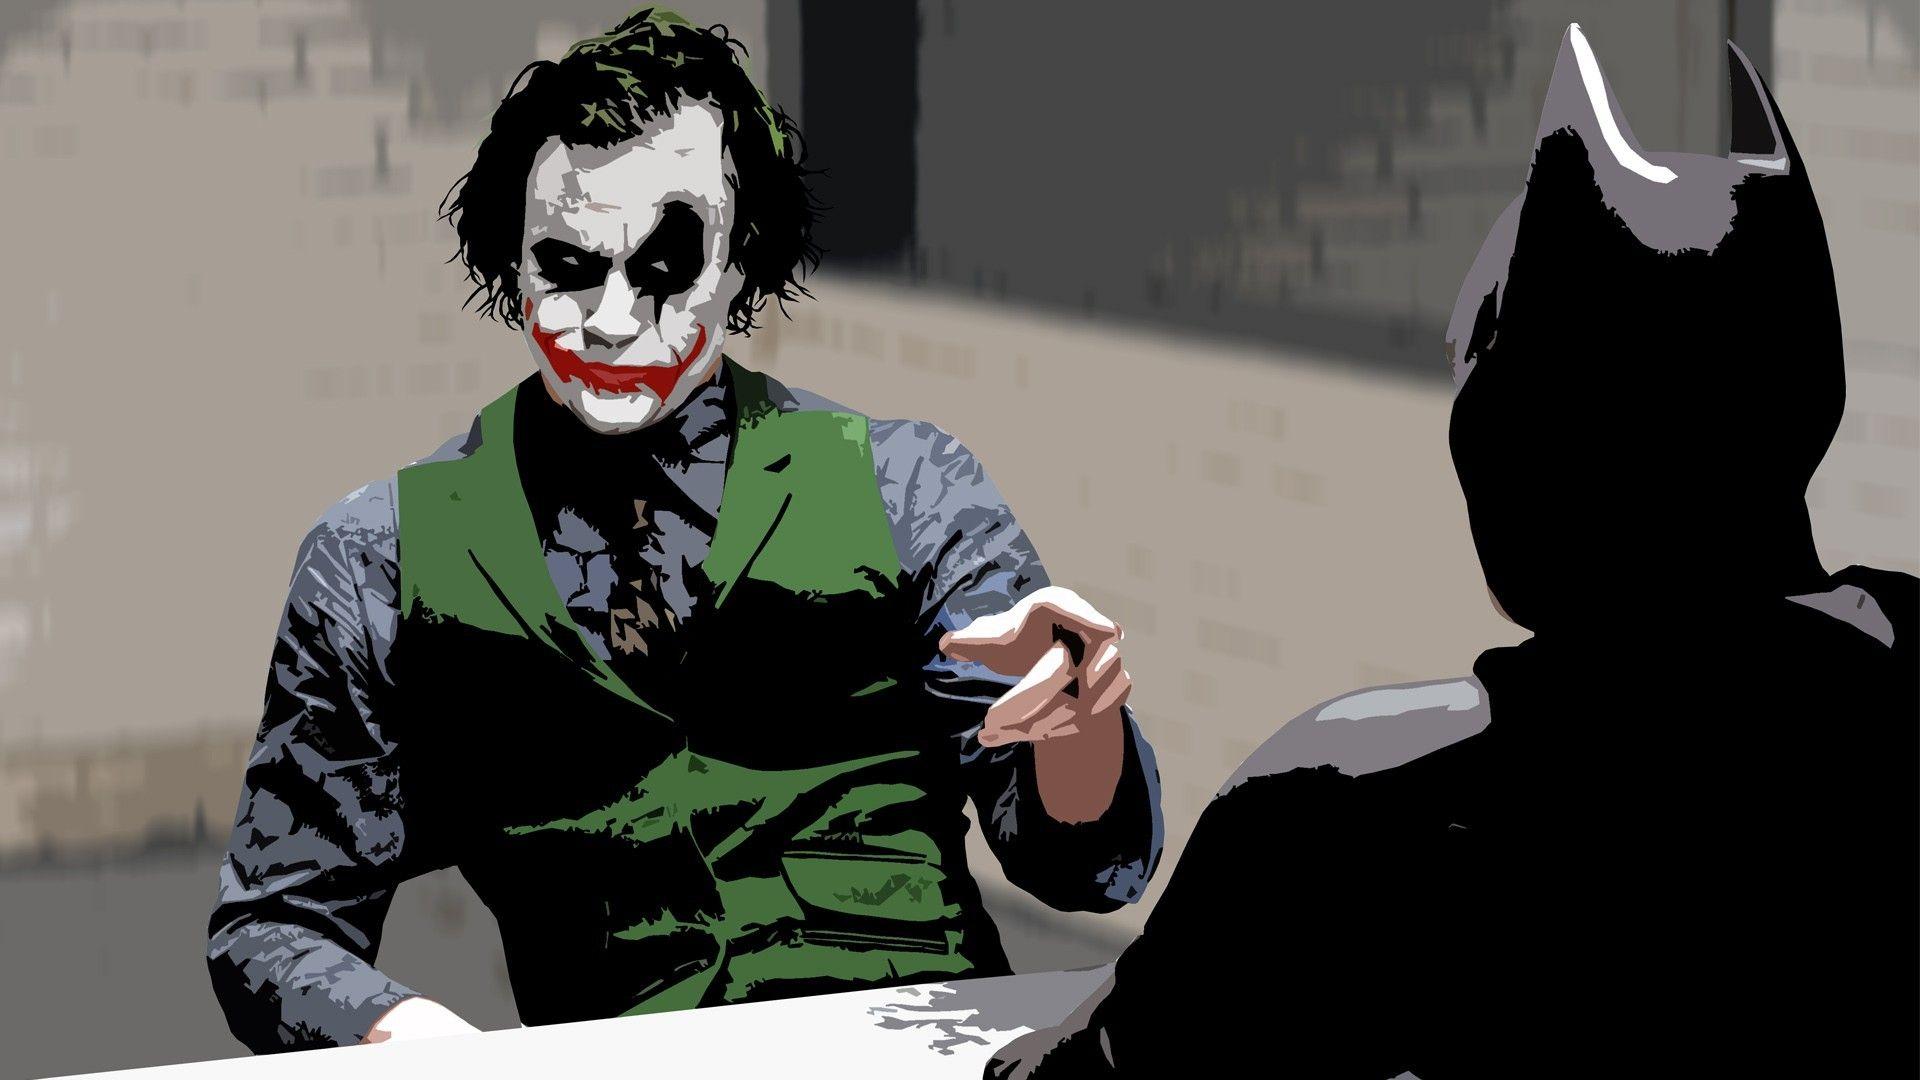 Hd wallpaper of joker - The Joker Wallpapers 1920 1080 The Joker Dark Knight Wallpapers 53 Wallpapers